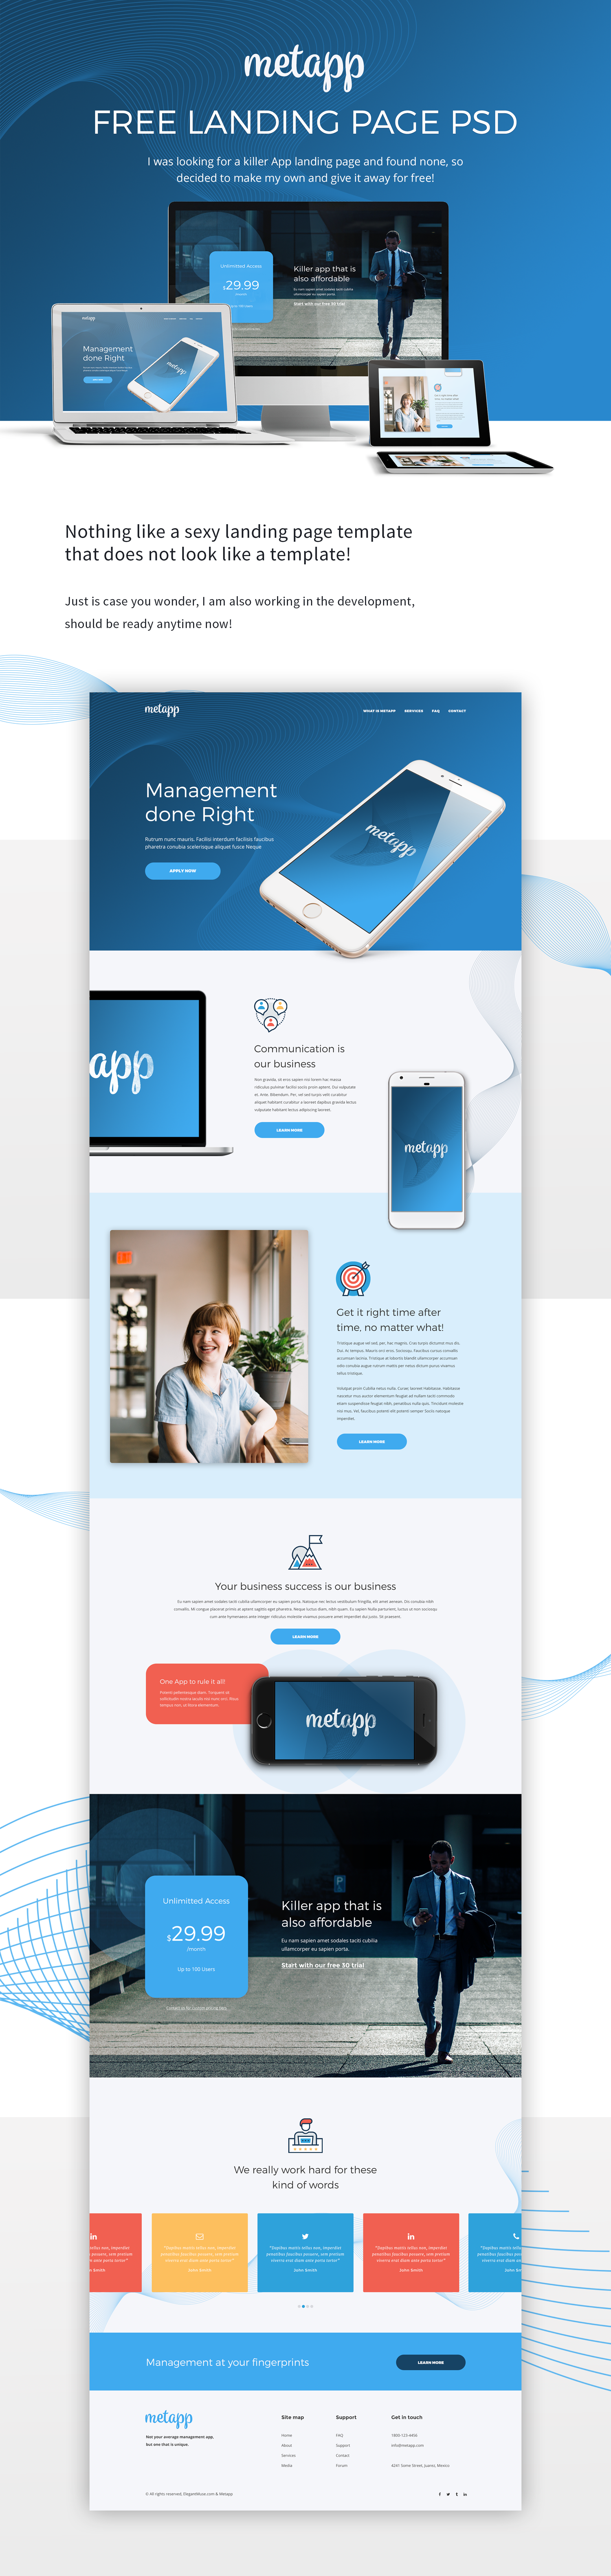 Presentation C Landing Page App Landing Page Free Web Design